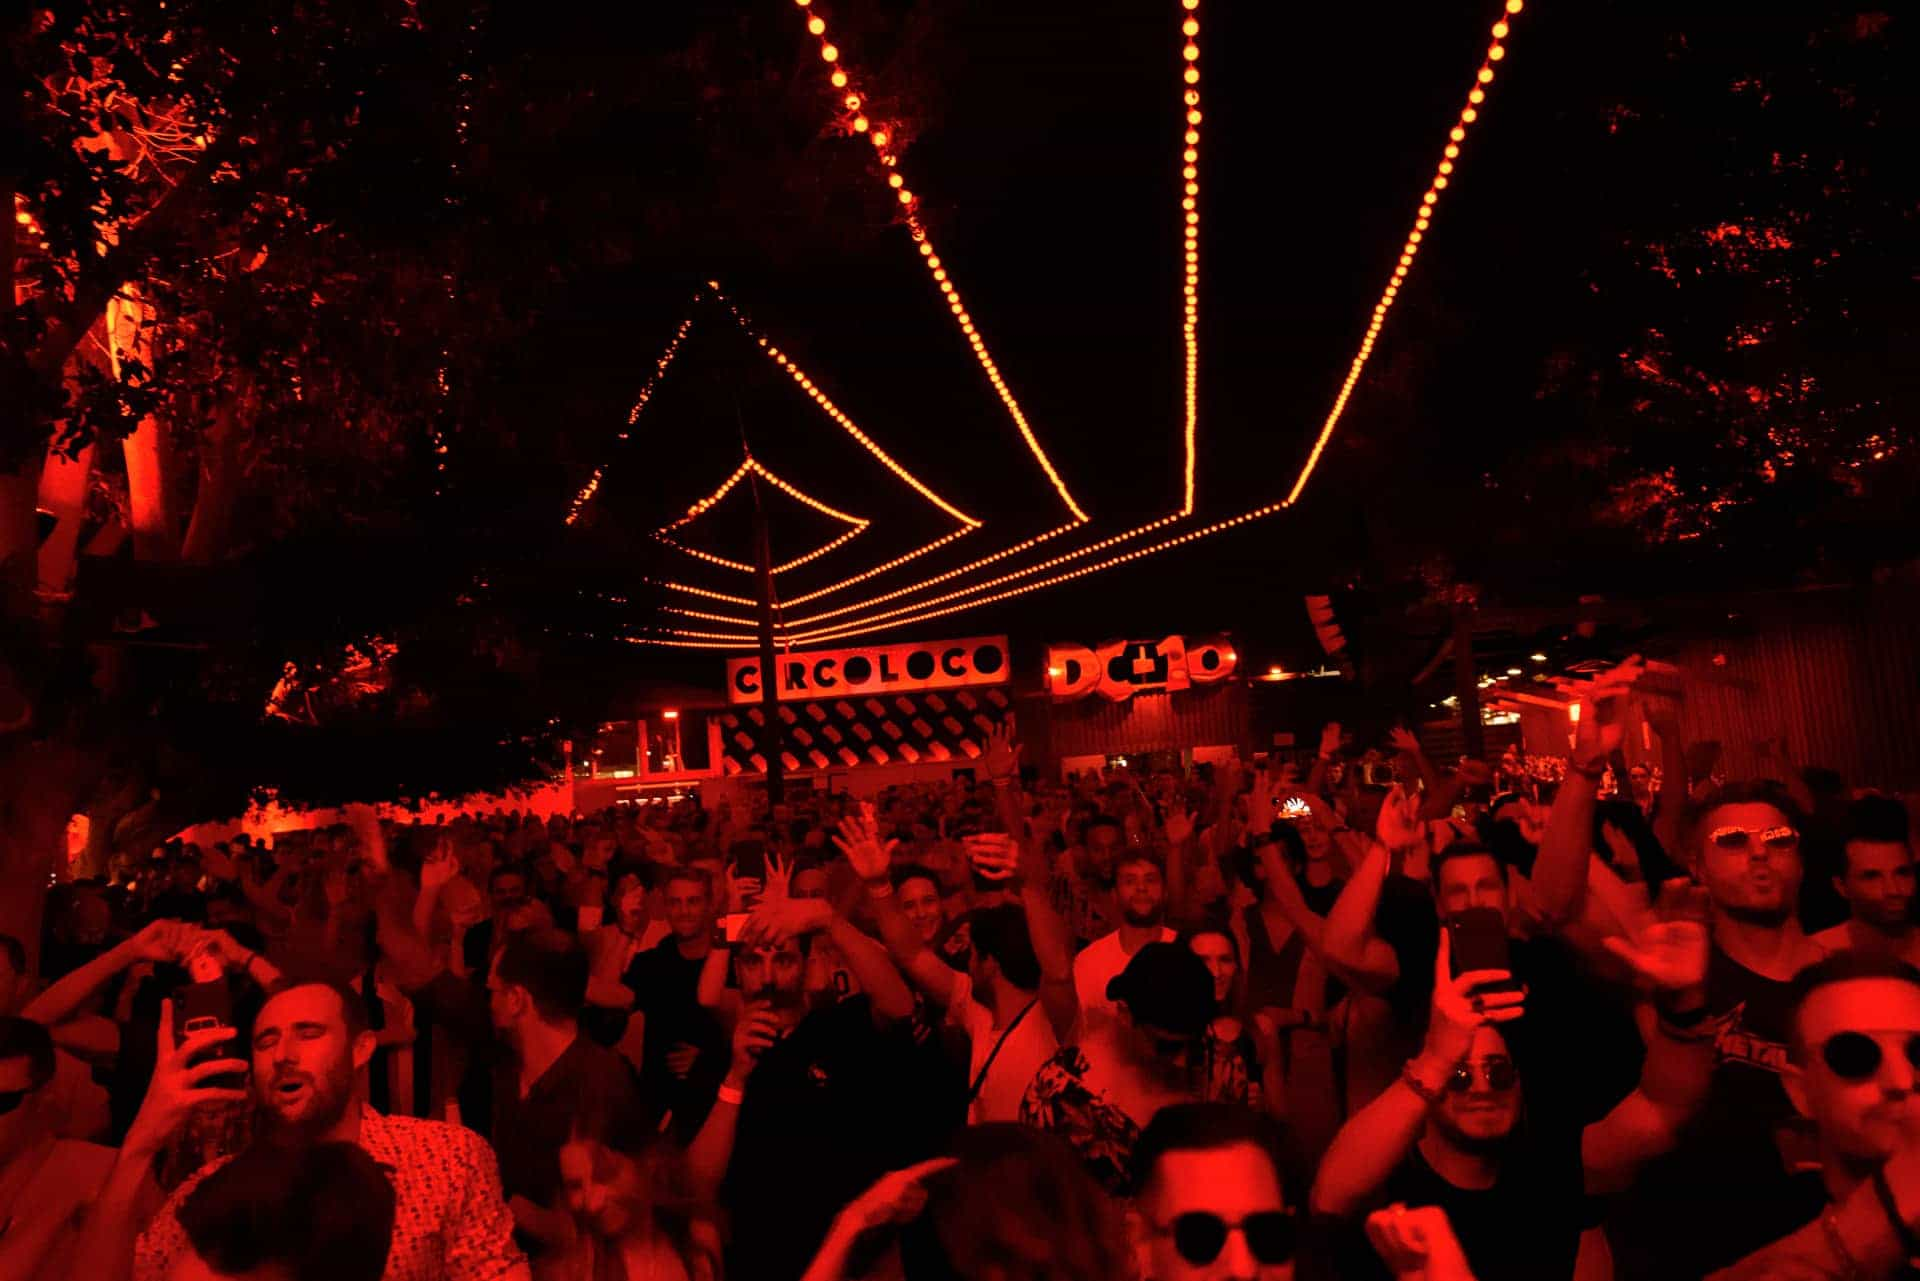 Circoloco Ibiza 2020 - Tickets, Events and Lineup 4